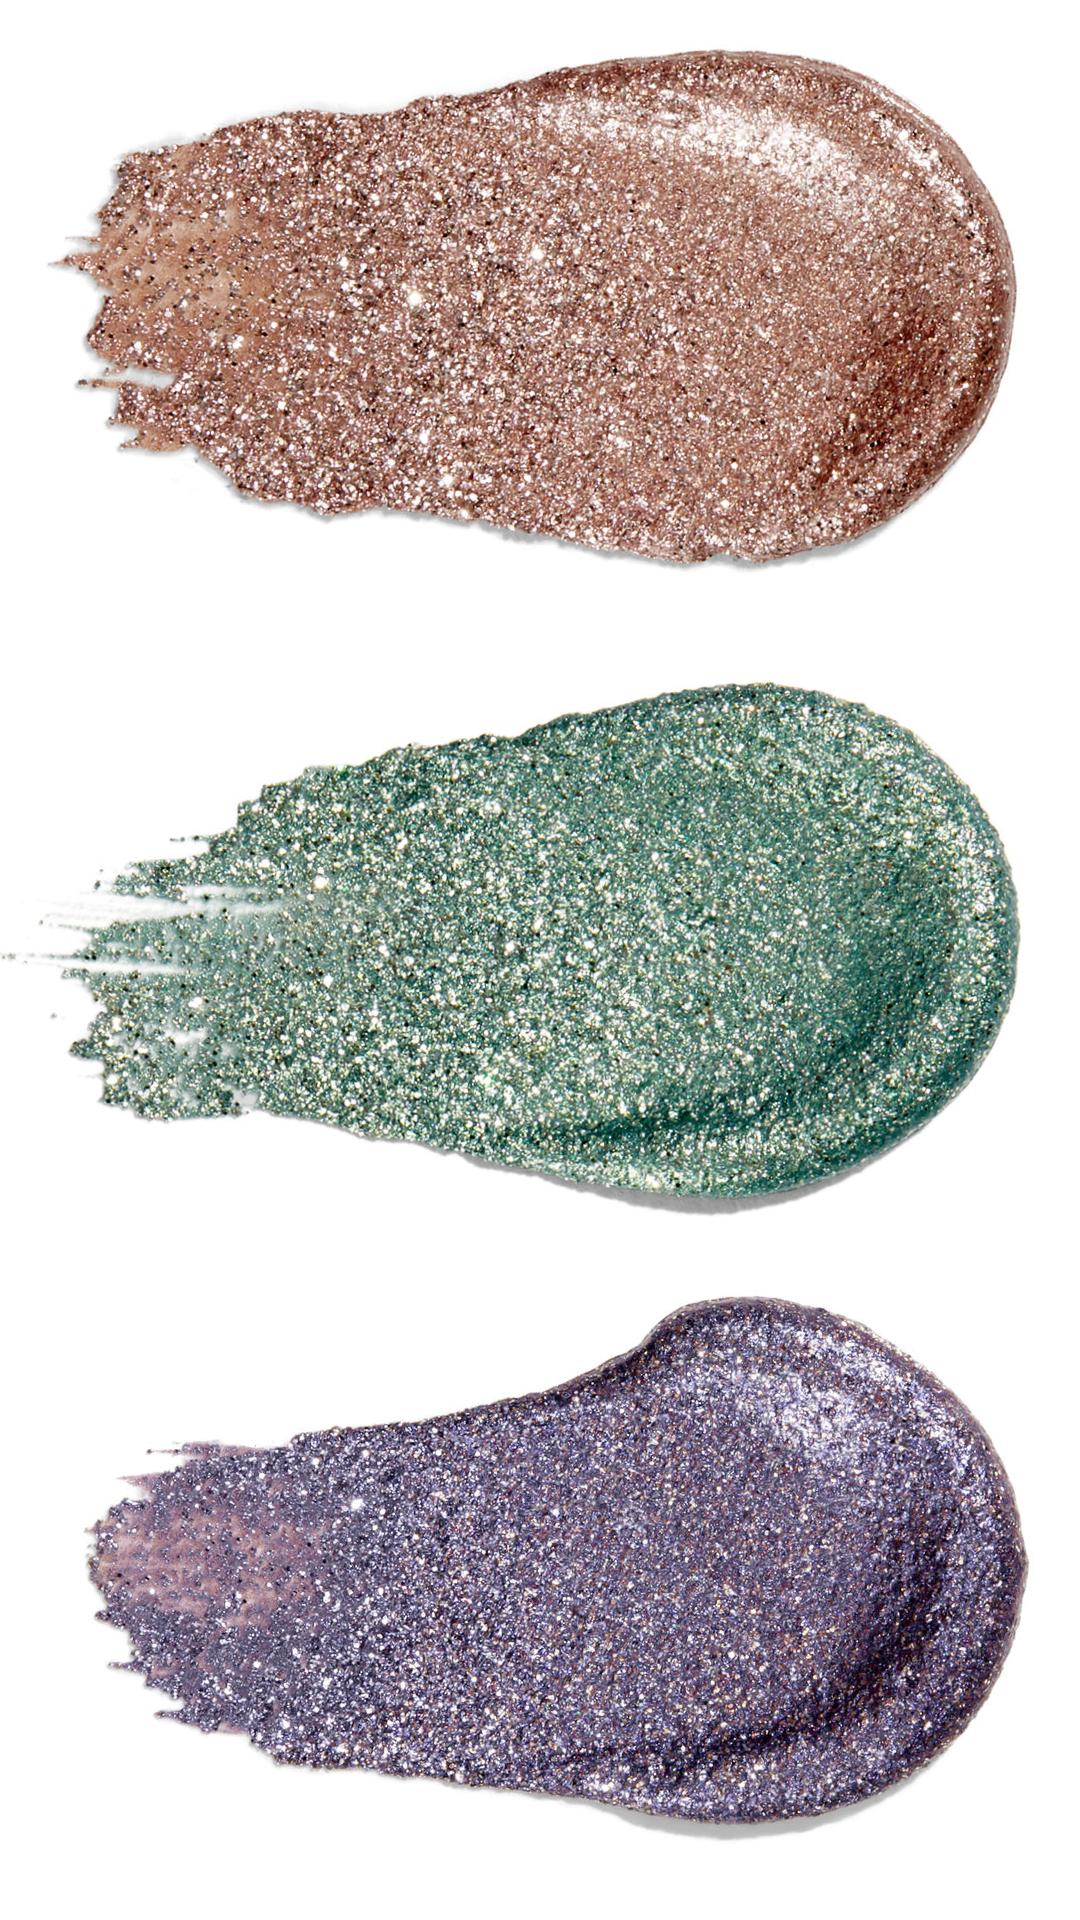 ELF New Liquid Glitter Eyeshadow Shades Summer 2020